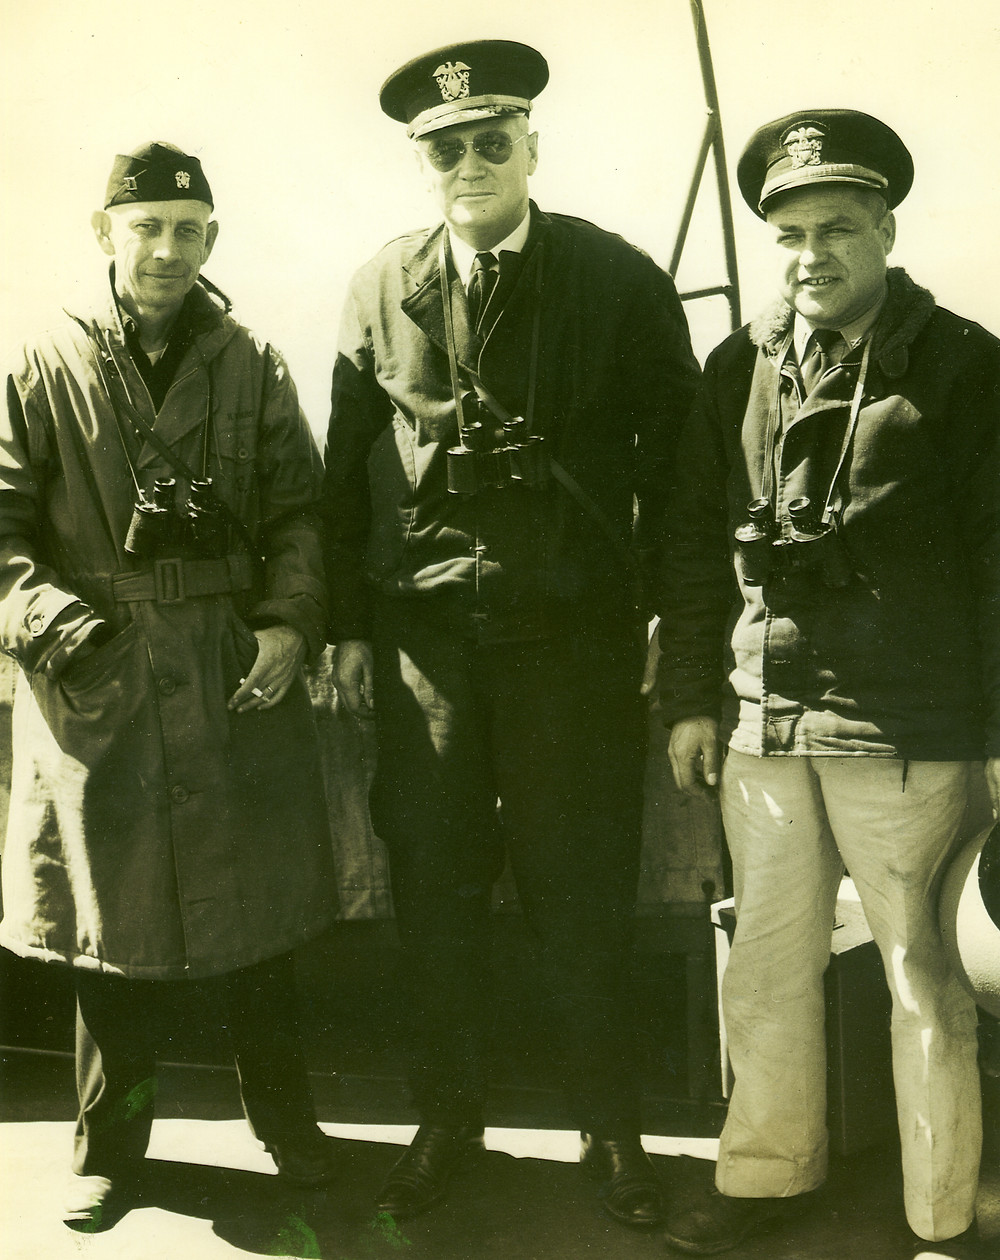 Dadah on the far right